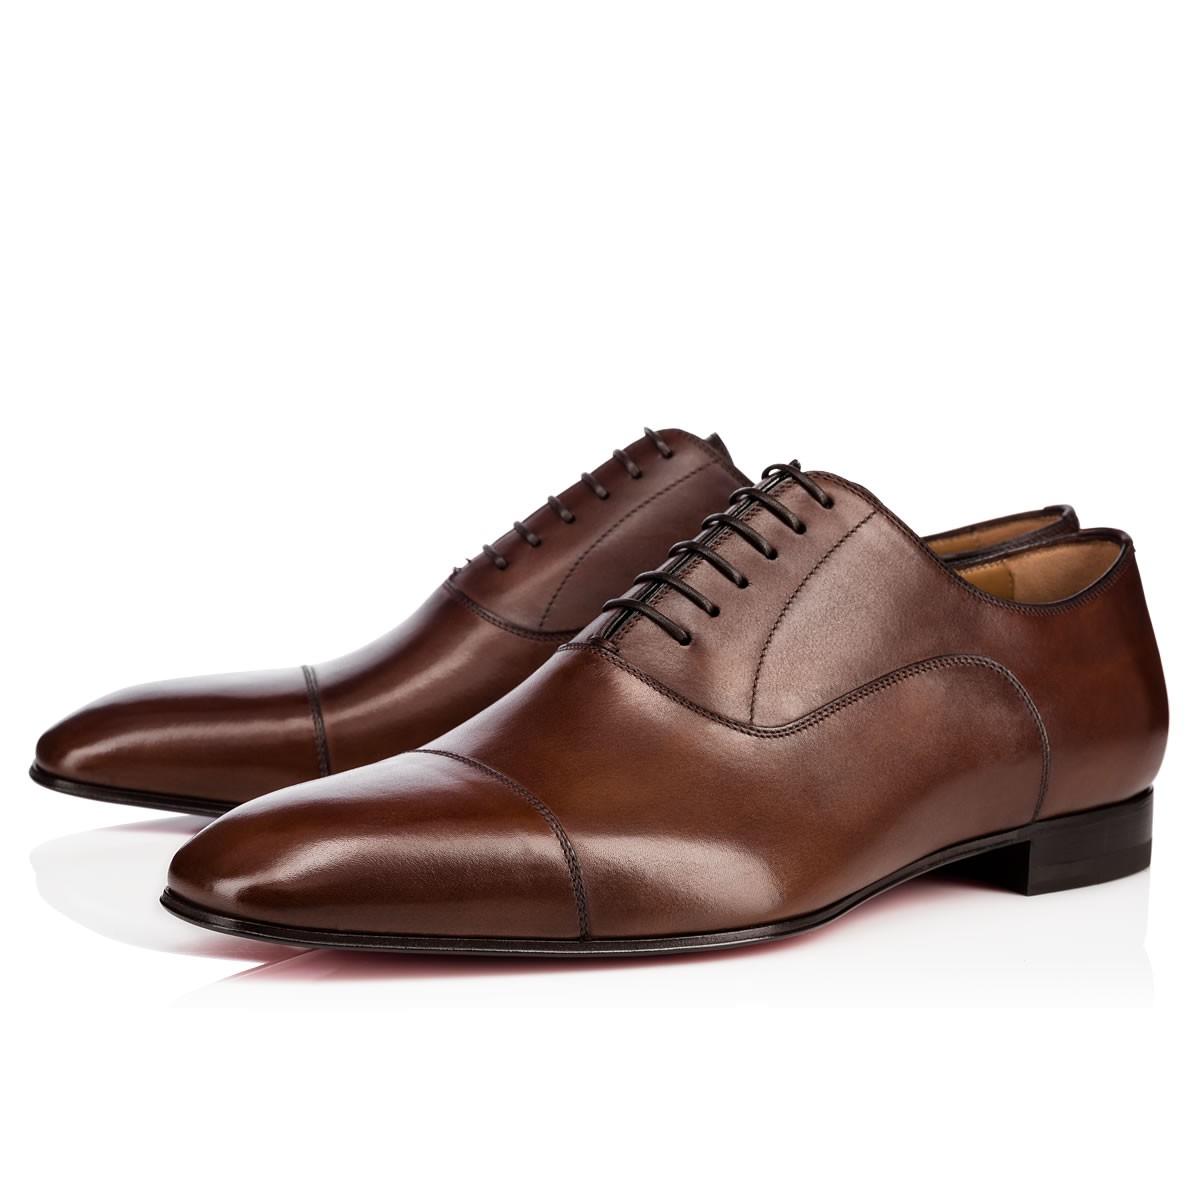 Christian Louboutin Brown Greggo Flat Shoes